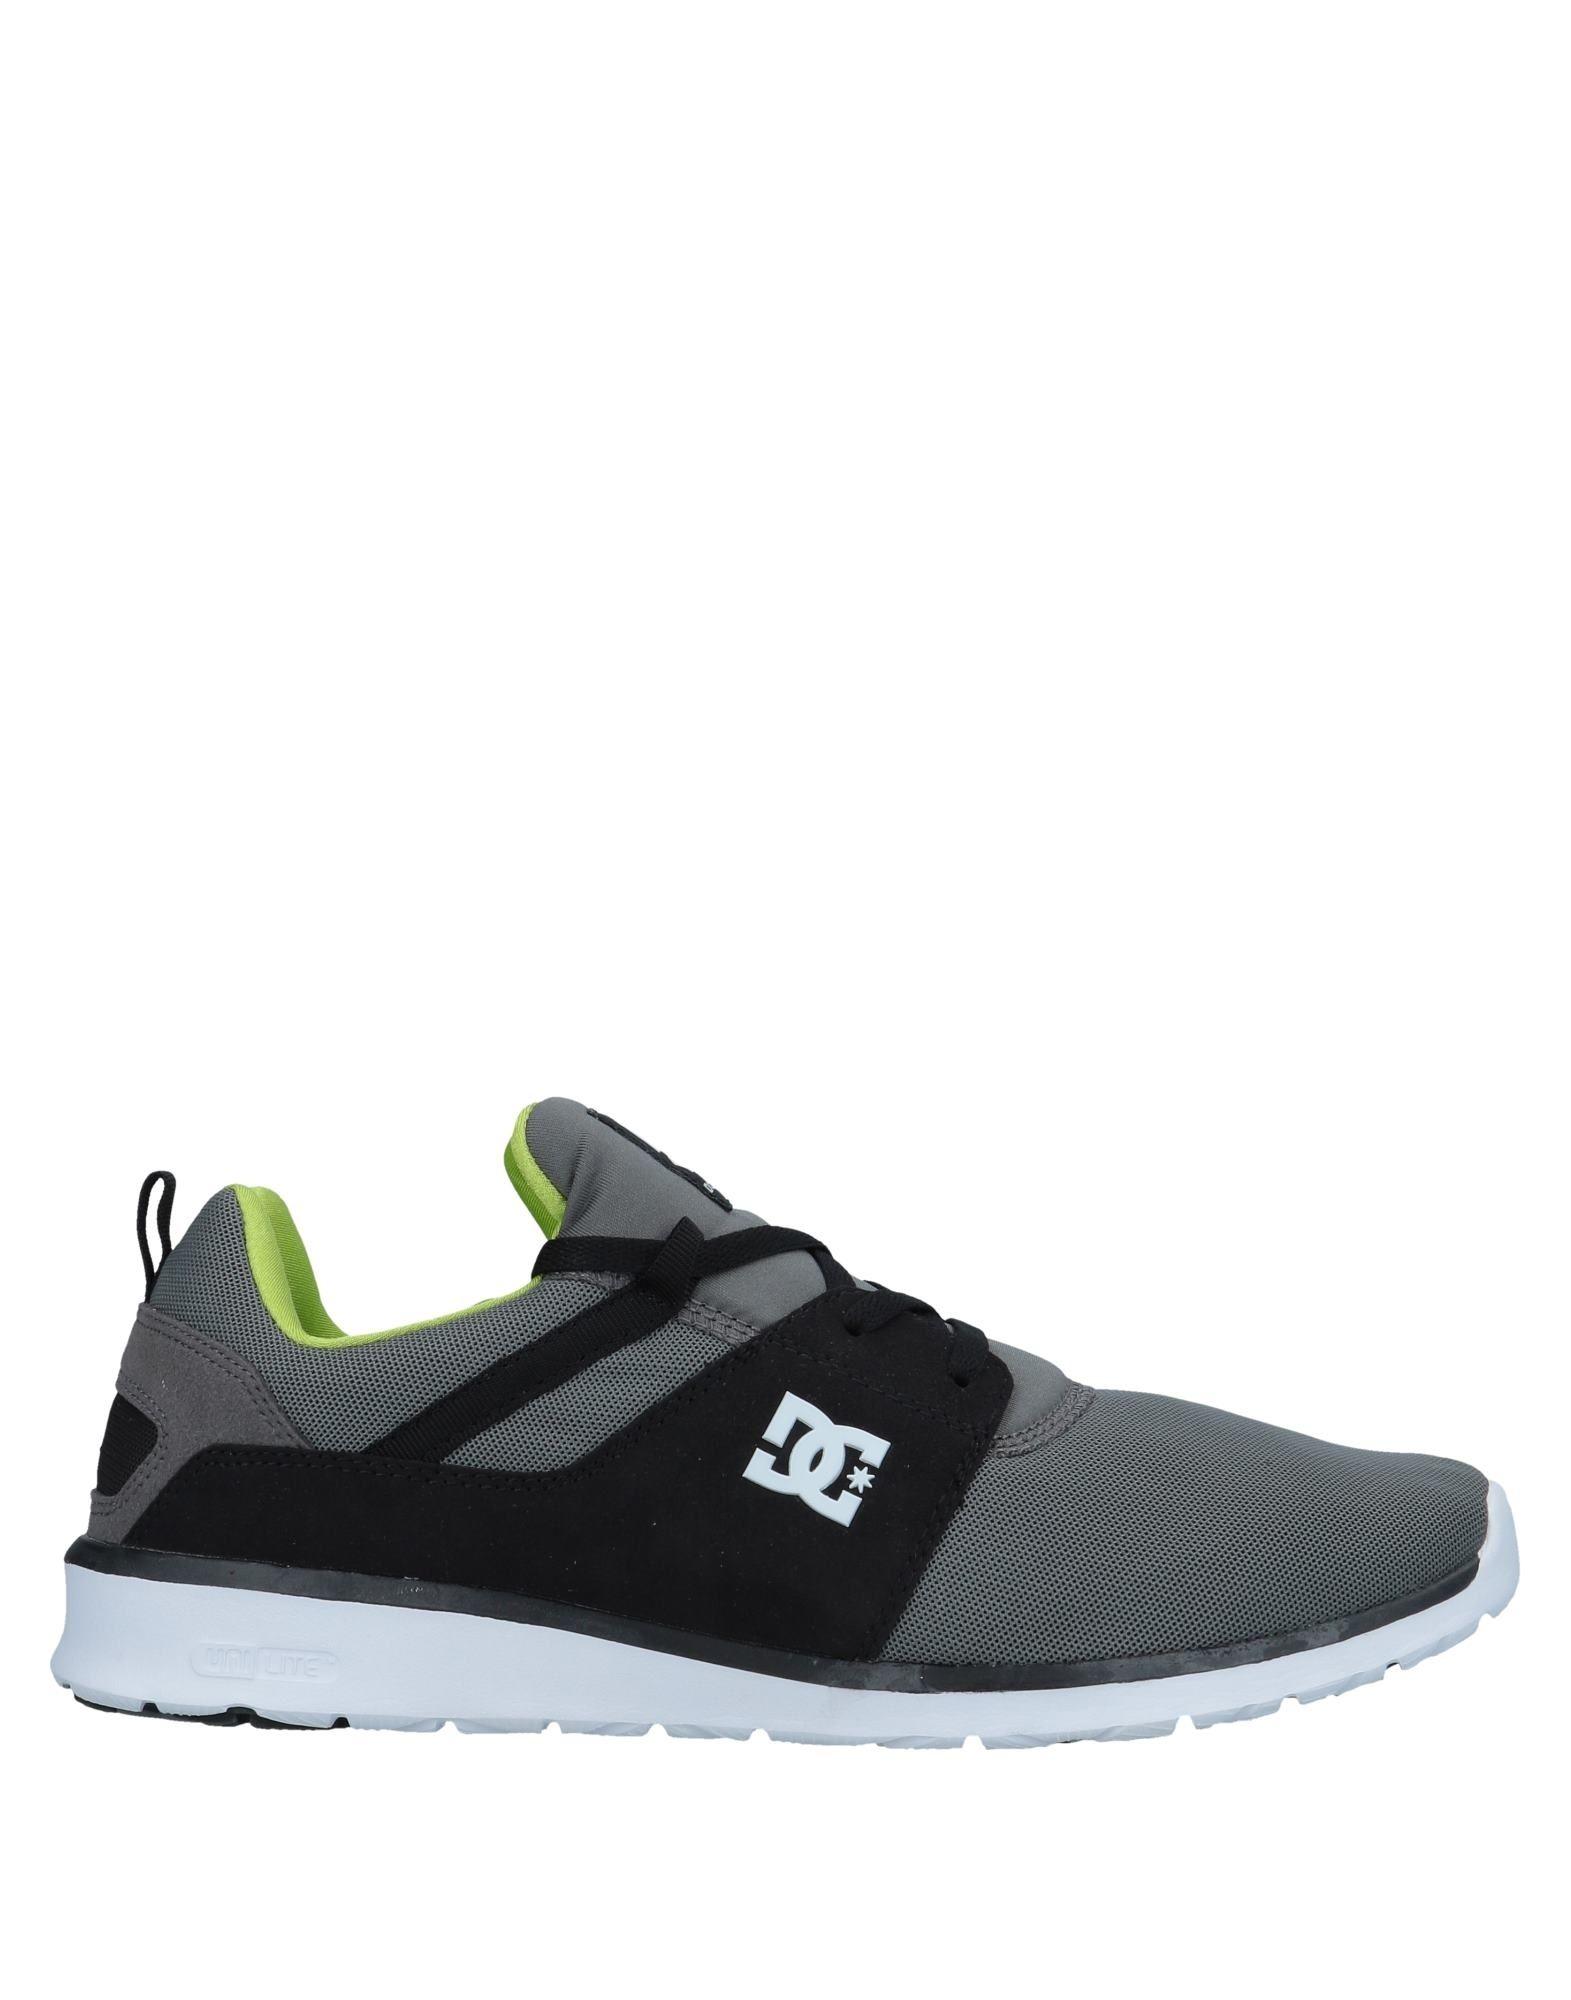 Dc Shoecousa Sneakers - Dc Men Dc - Shoecousa Sneakers online on  United Kingdom - 11556068KU 715adc